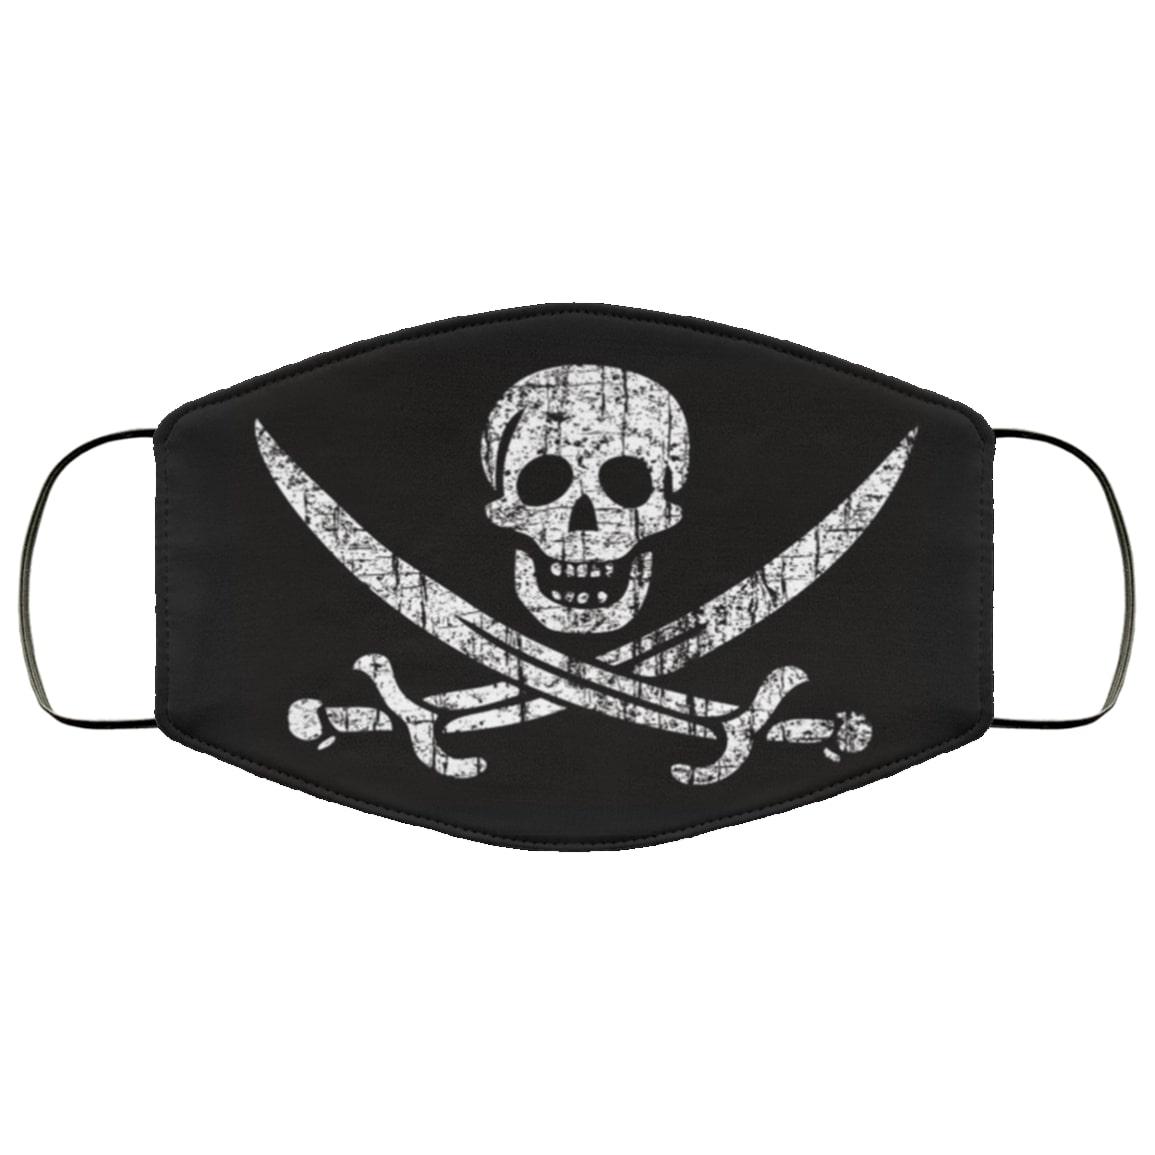 Pirate flags jack captain skull sword full over printed face mask 3